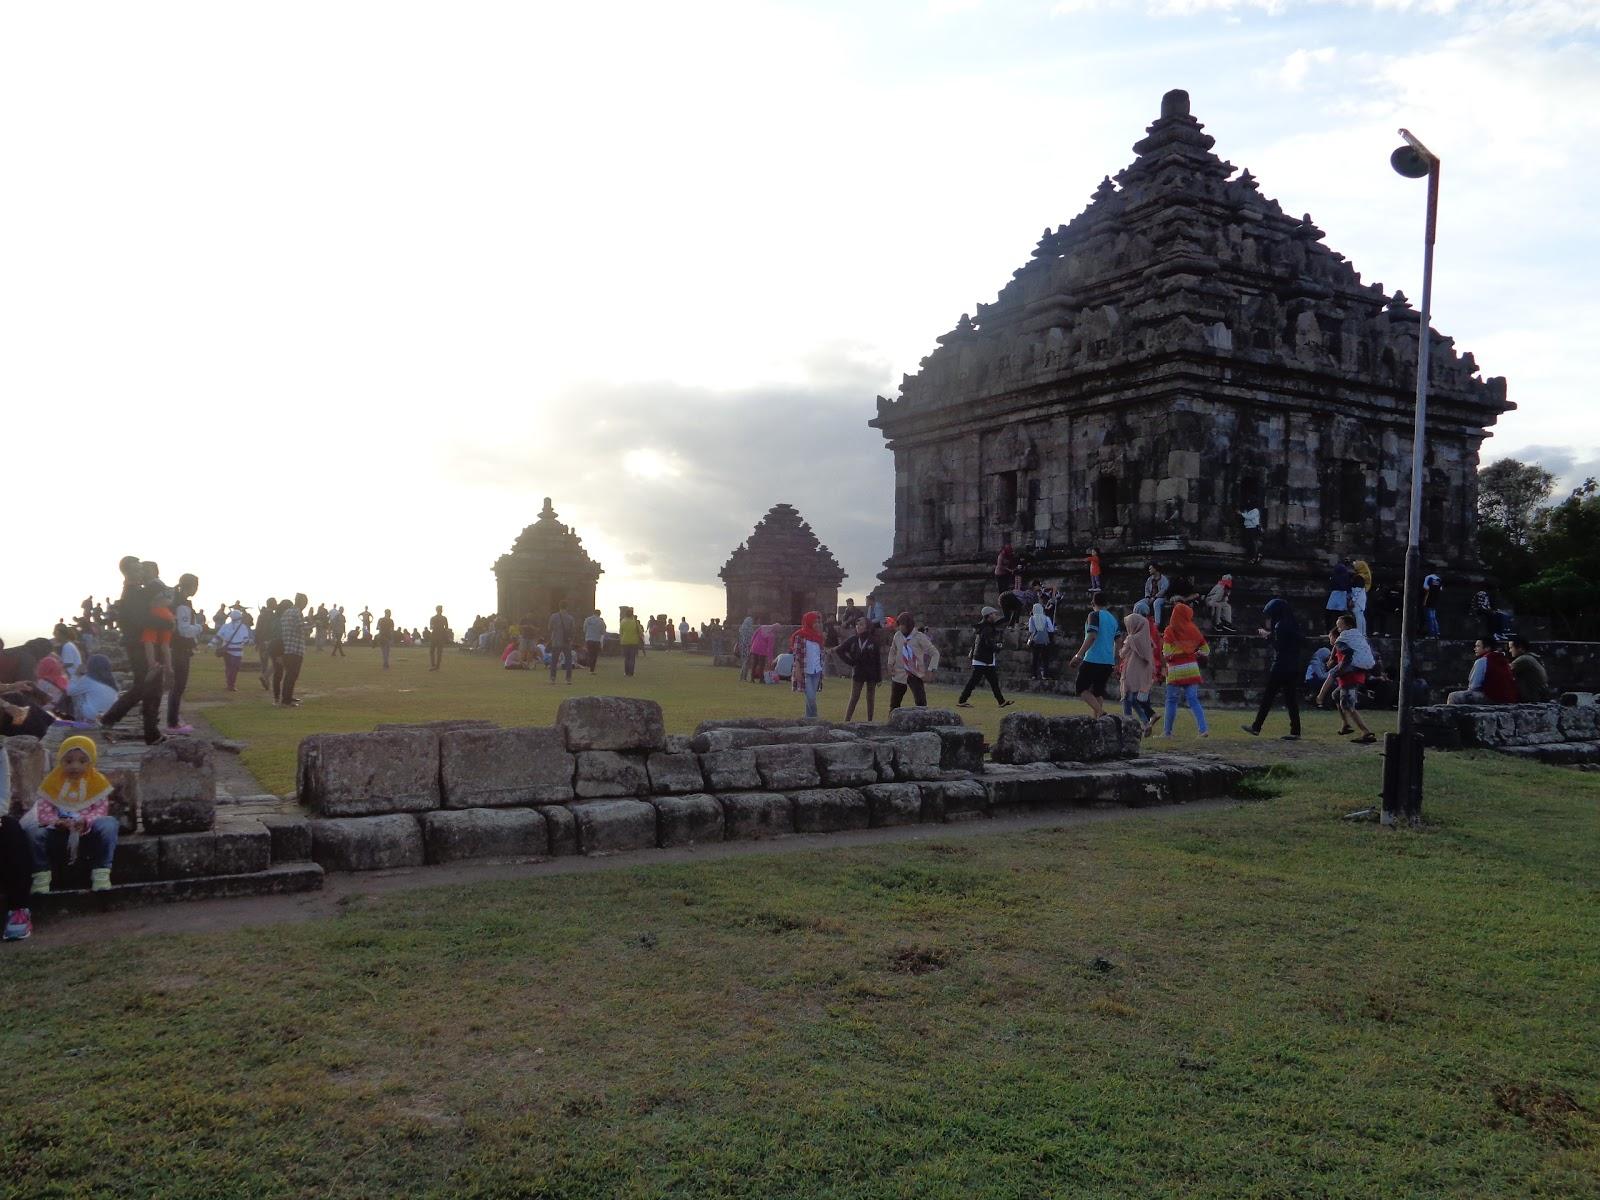 Wisata Candi Ijo Menikmati Sunset Yogyakarta Berlokasi Bukit Sambirejo Kecamatan